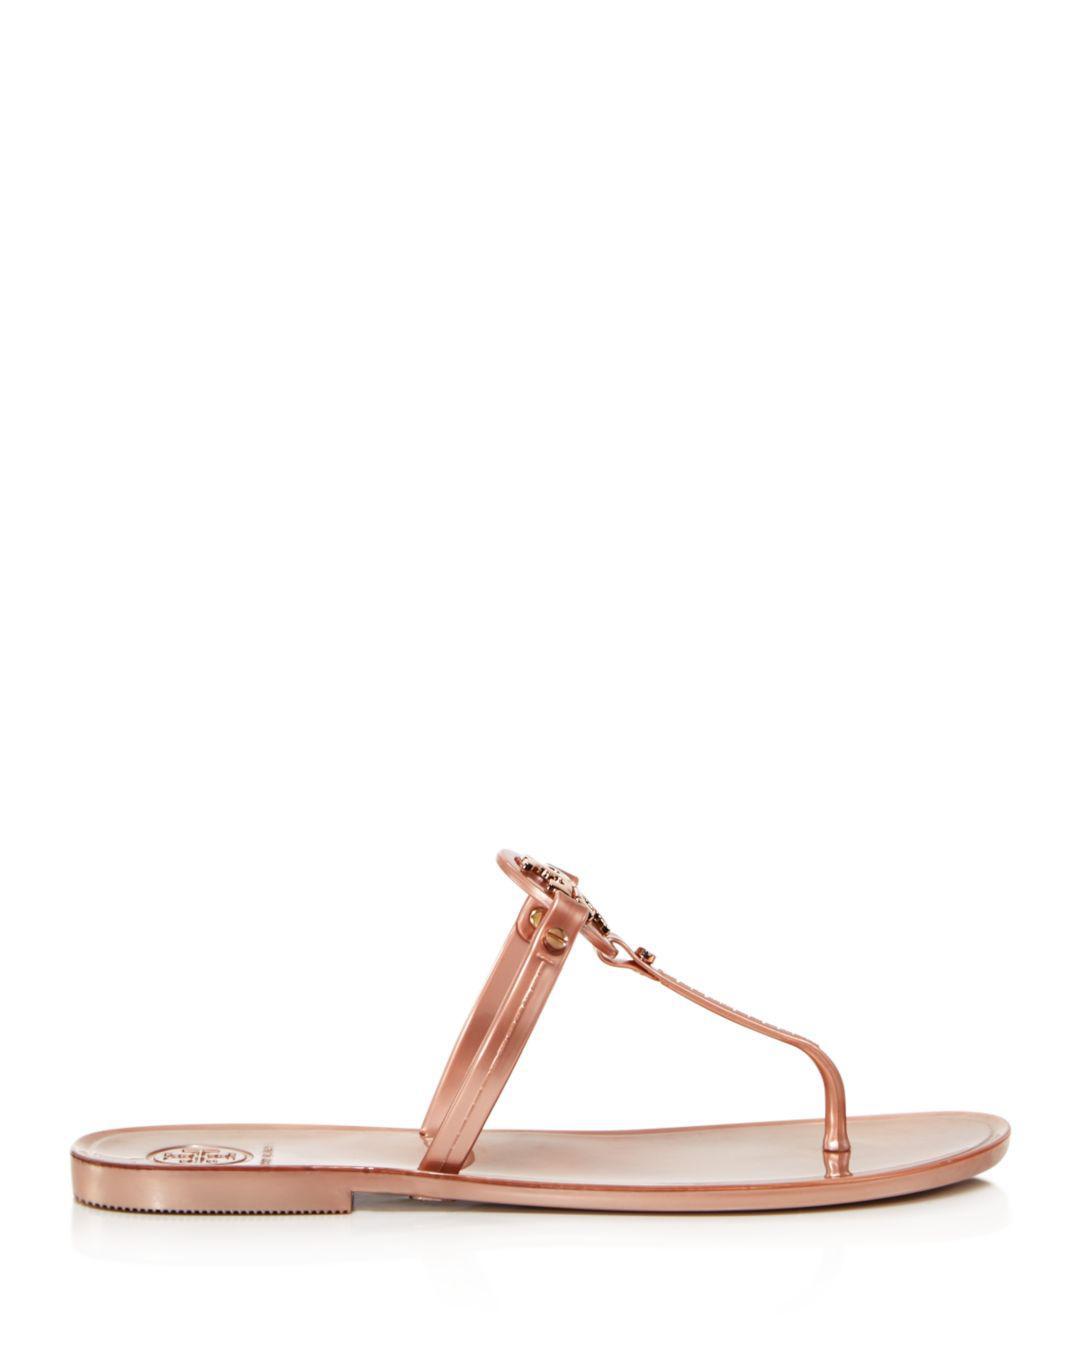 ded05fbf1bc356 Lyst - Tory Burch Mini Miller Jelly Flat Thong Sandals